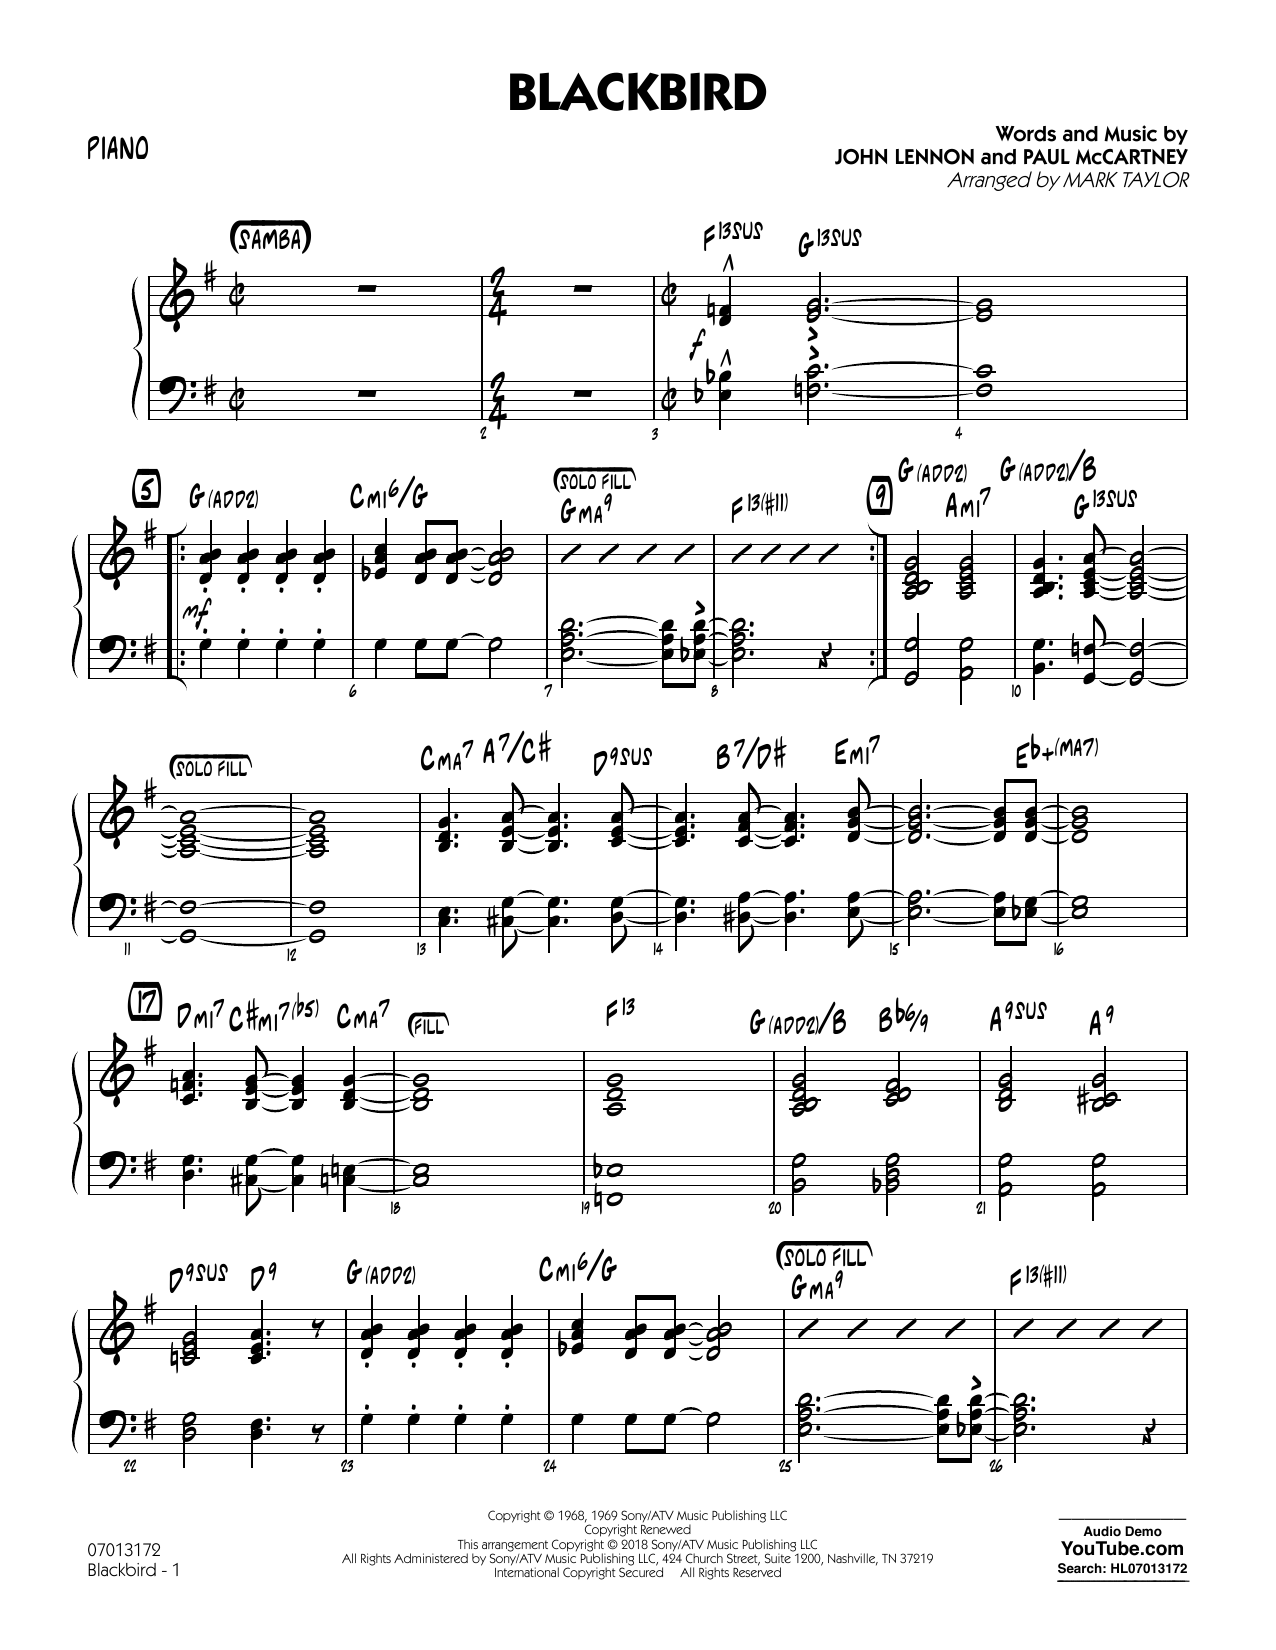 Blackbird - Piano by Mark Taylor Jazz Ensemble Digital Sheet Music